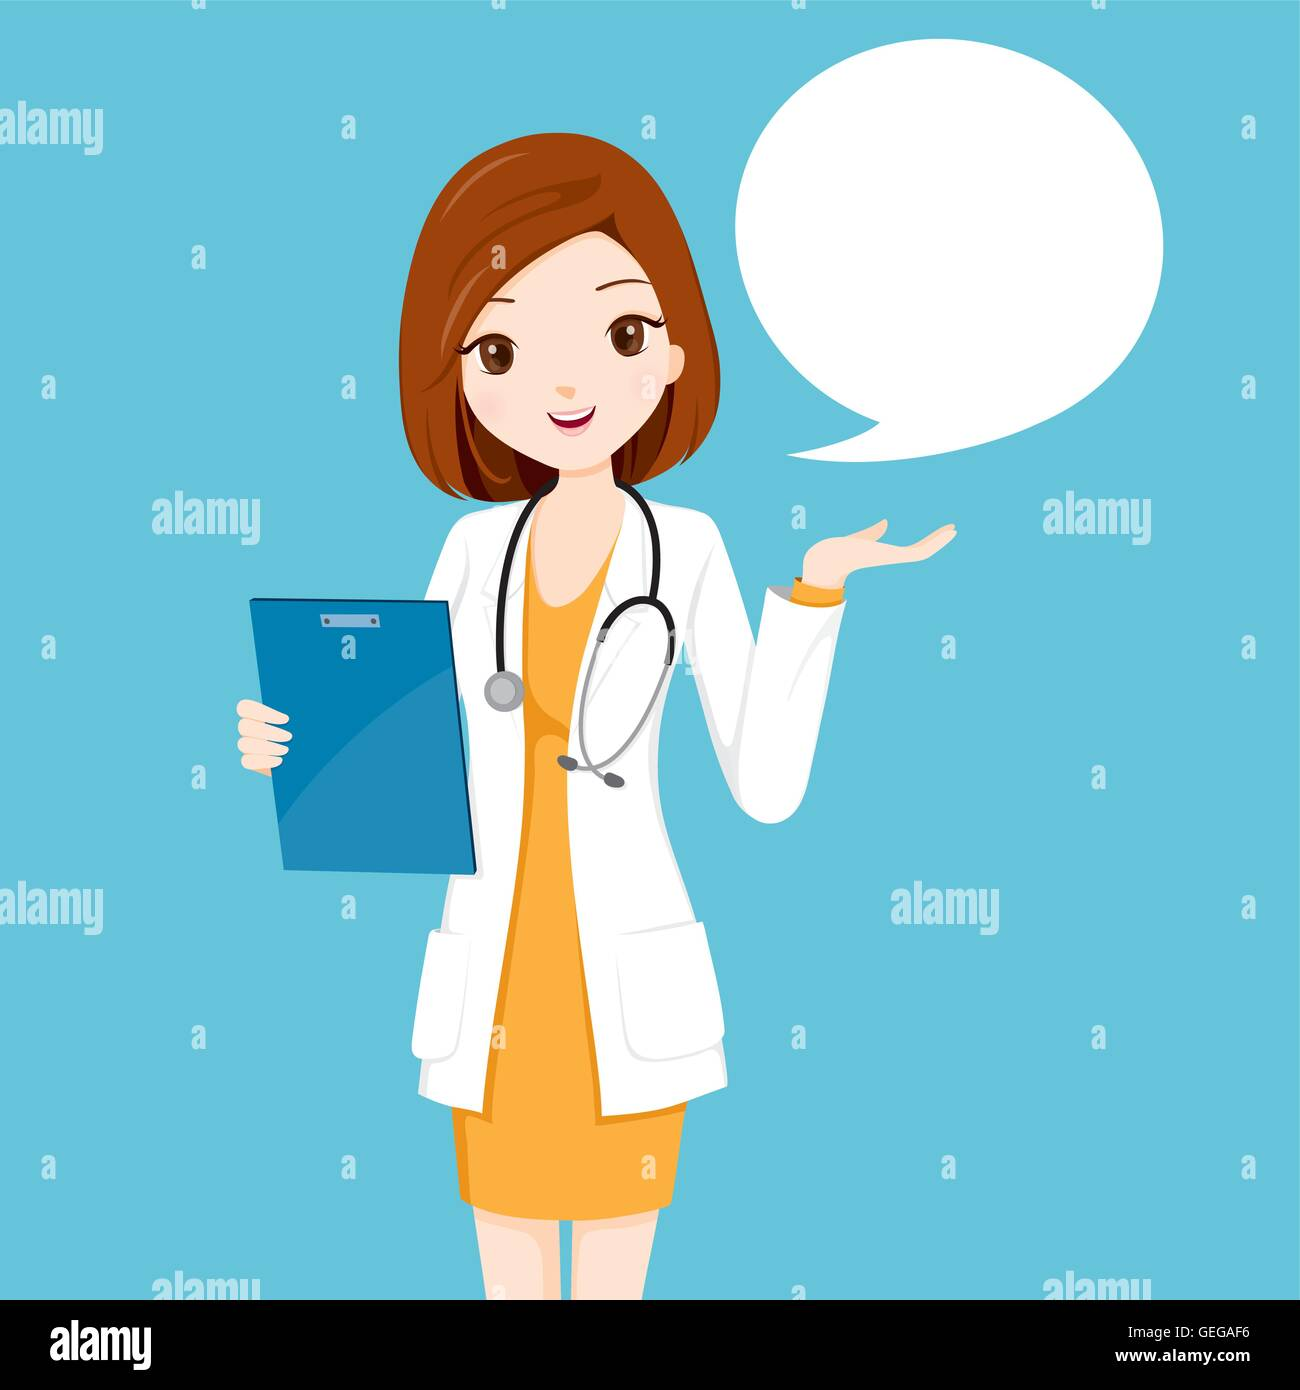 Doctora animada